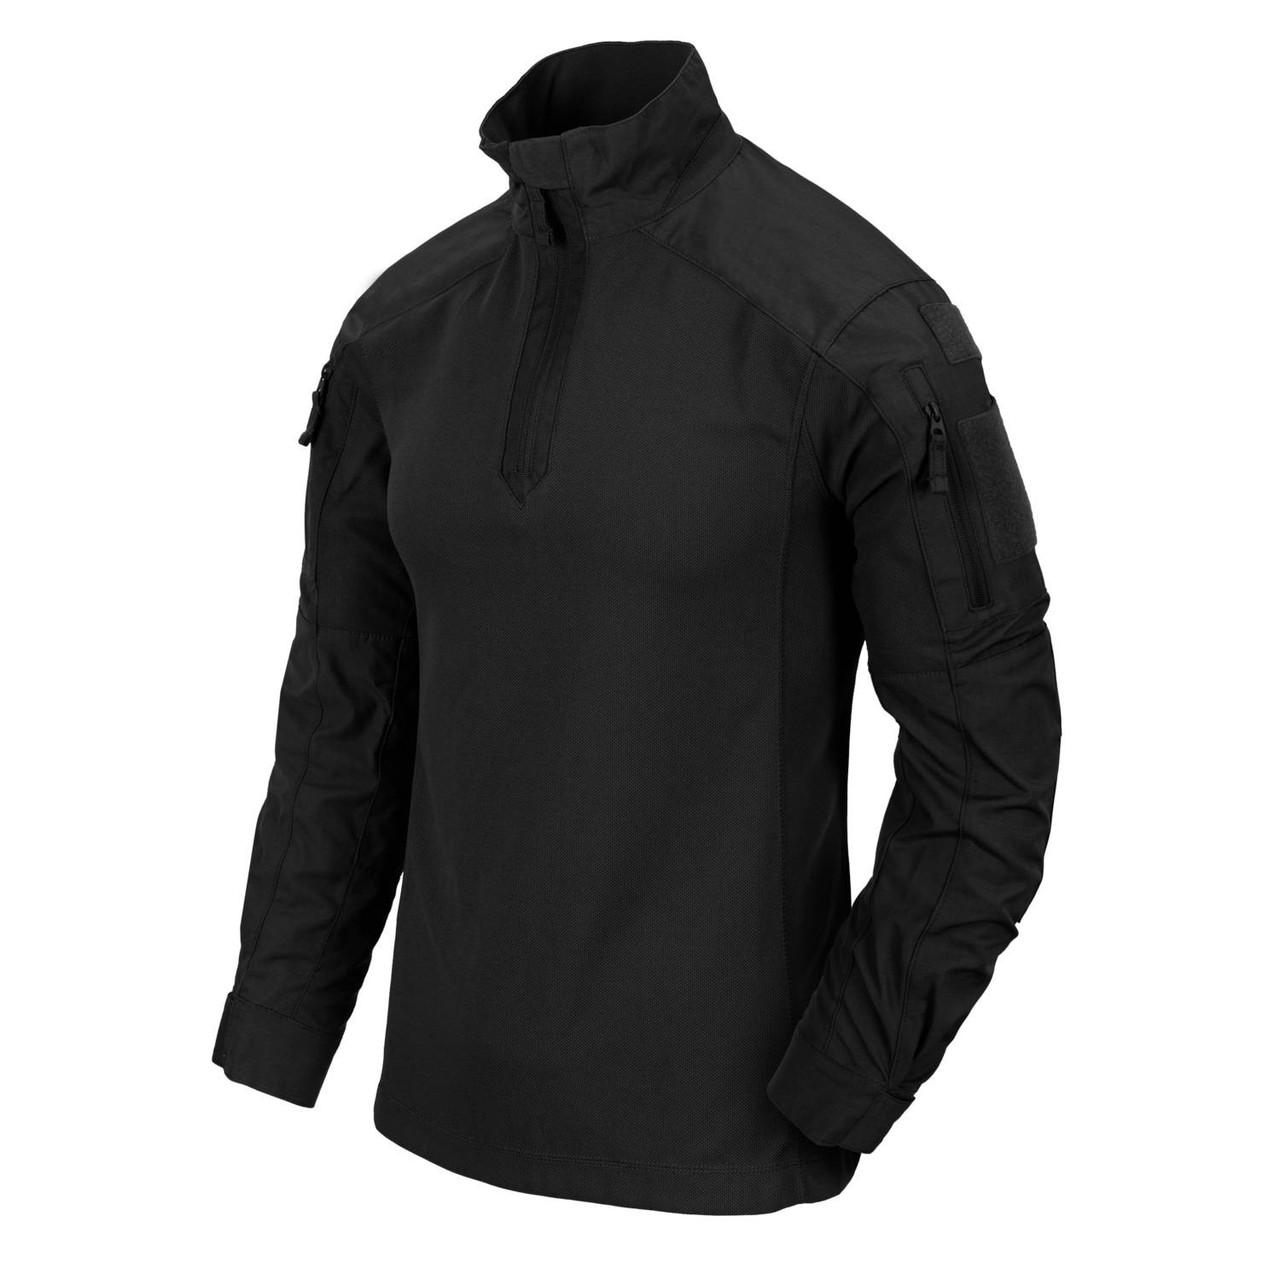 Рубашка боевая Helikon-Tex® MCDU Combat Shirt® - NyCo Ripstop - Black